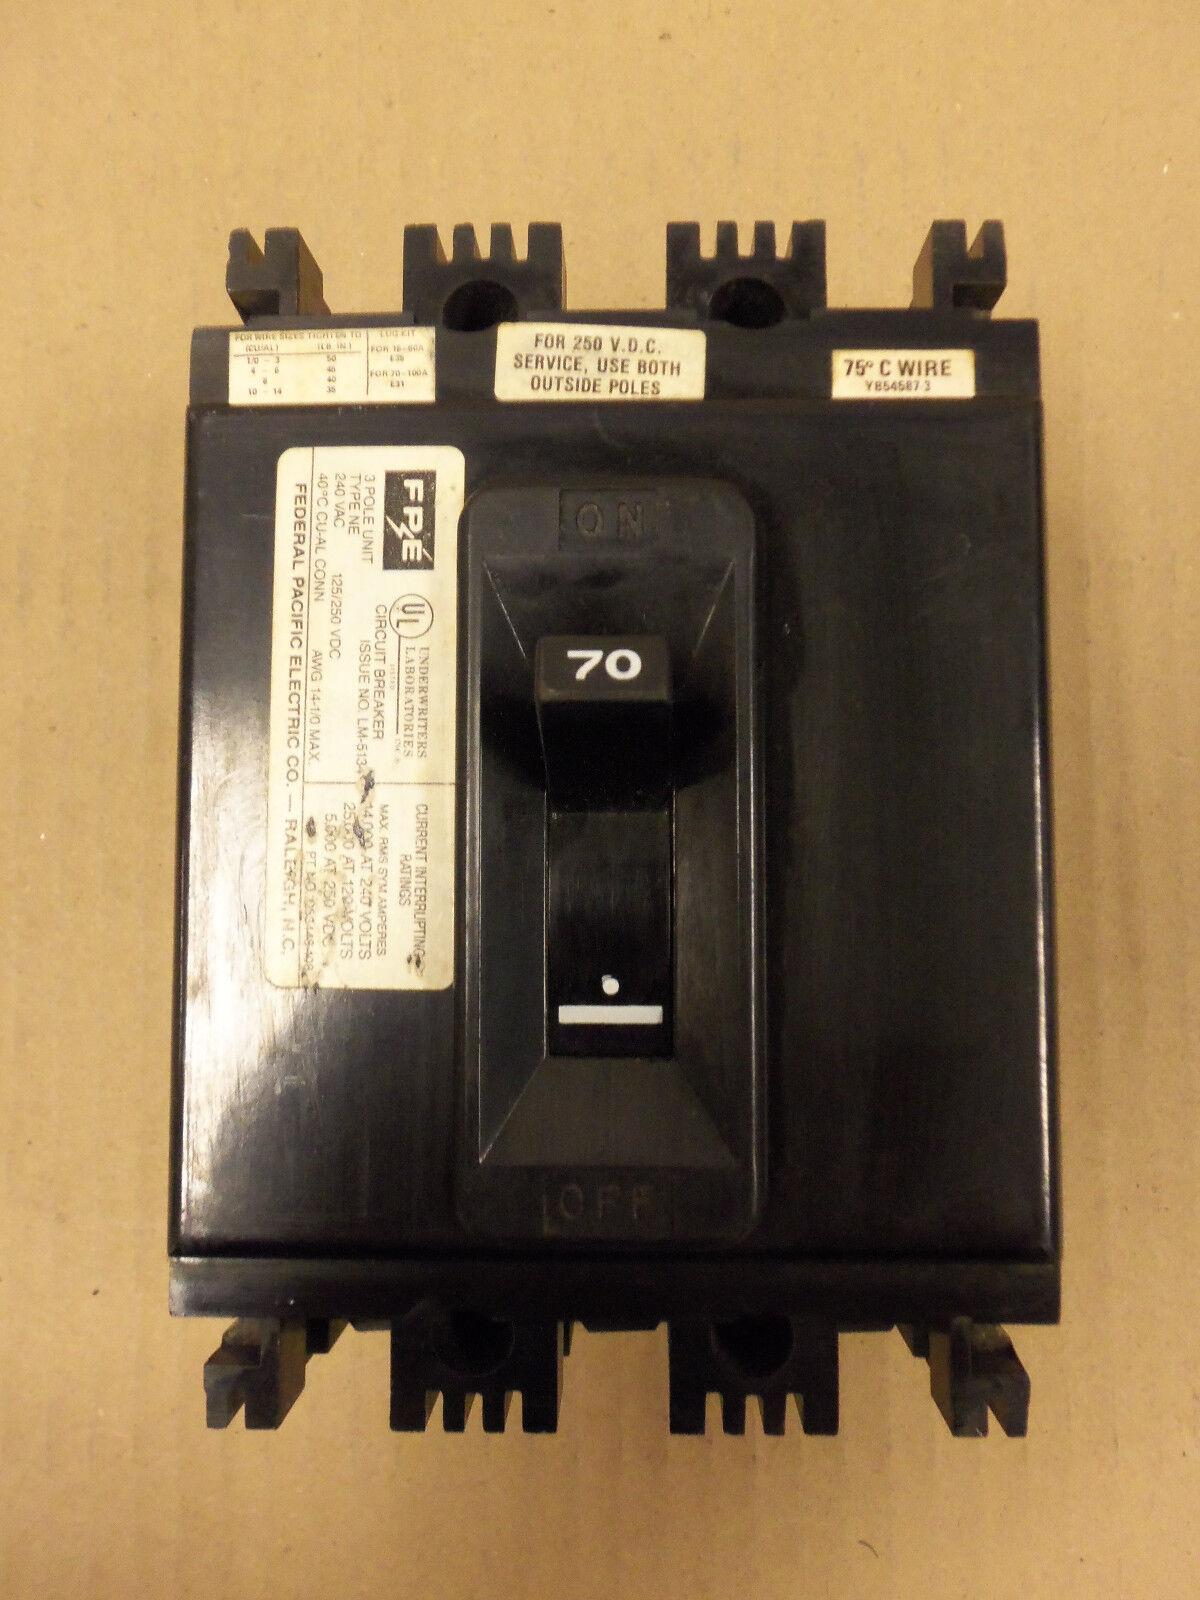 Federal Pacific Fpe Ne Ne233070 3 Pole 70 Amp 240v Circuit Breaker 200 Fuse Box Flawed Ebay